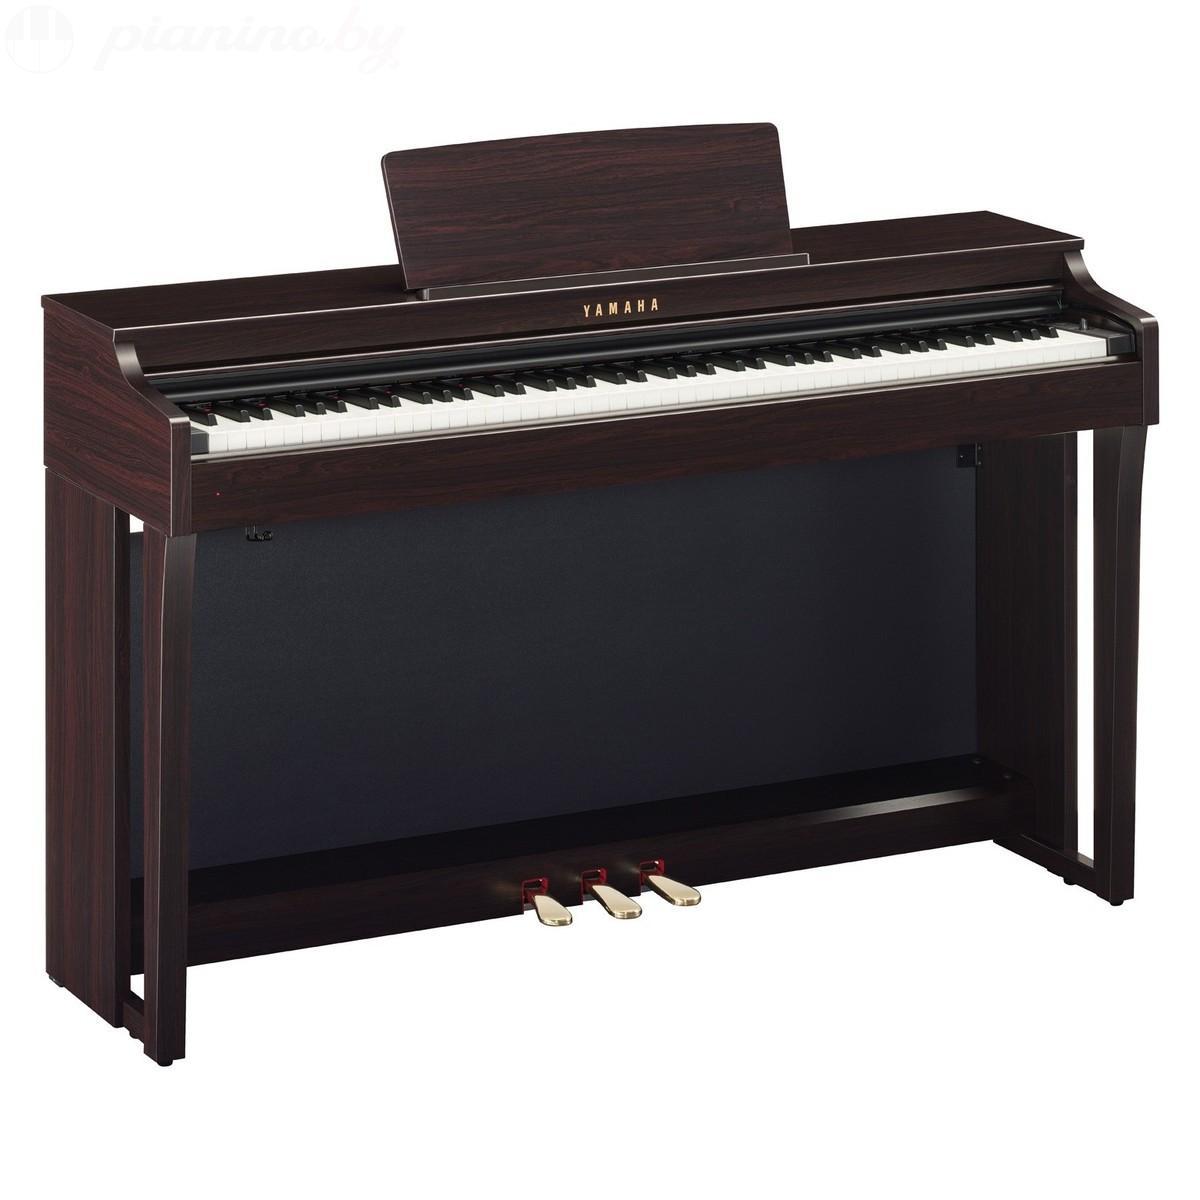 Цифровое пианино Yamaha Clavinova CLP-625 Dark Rosewood